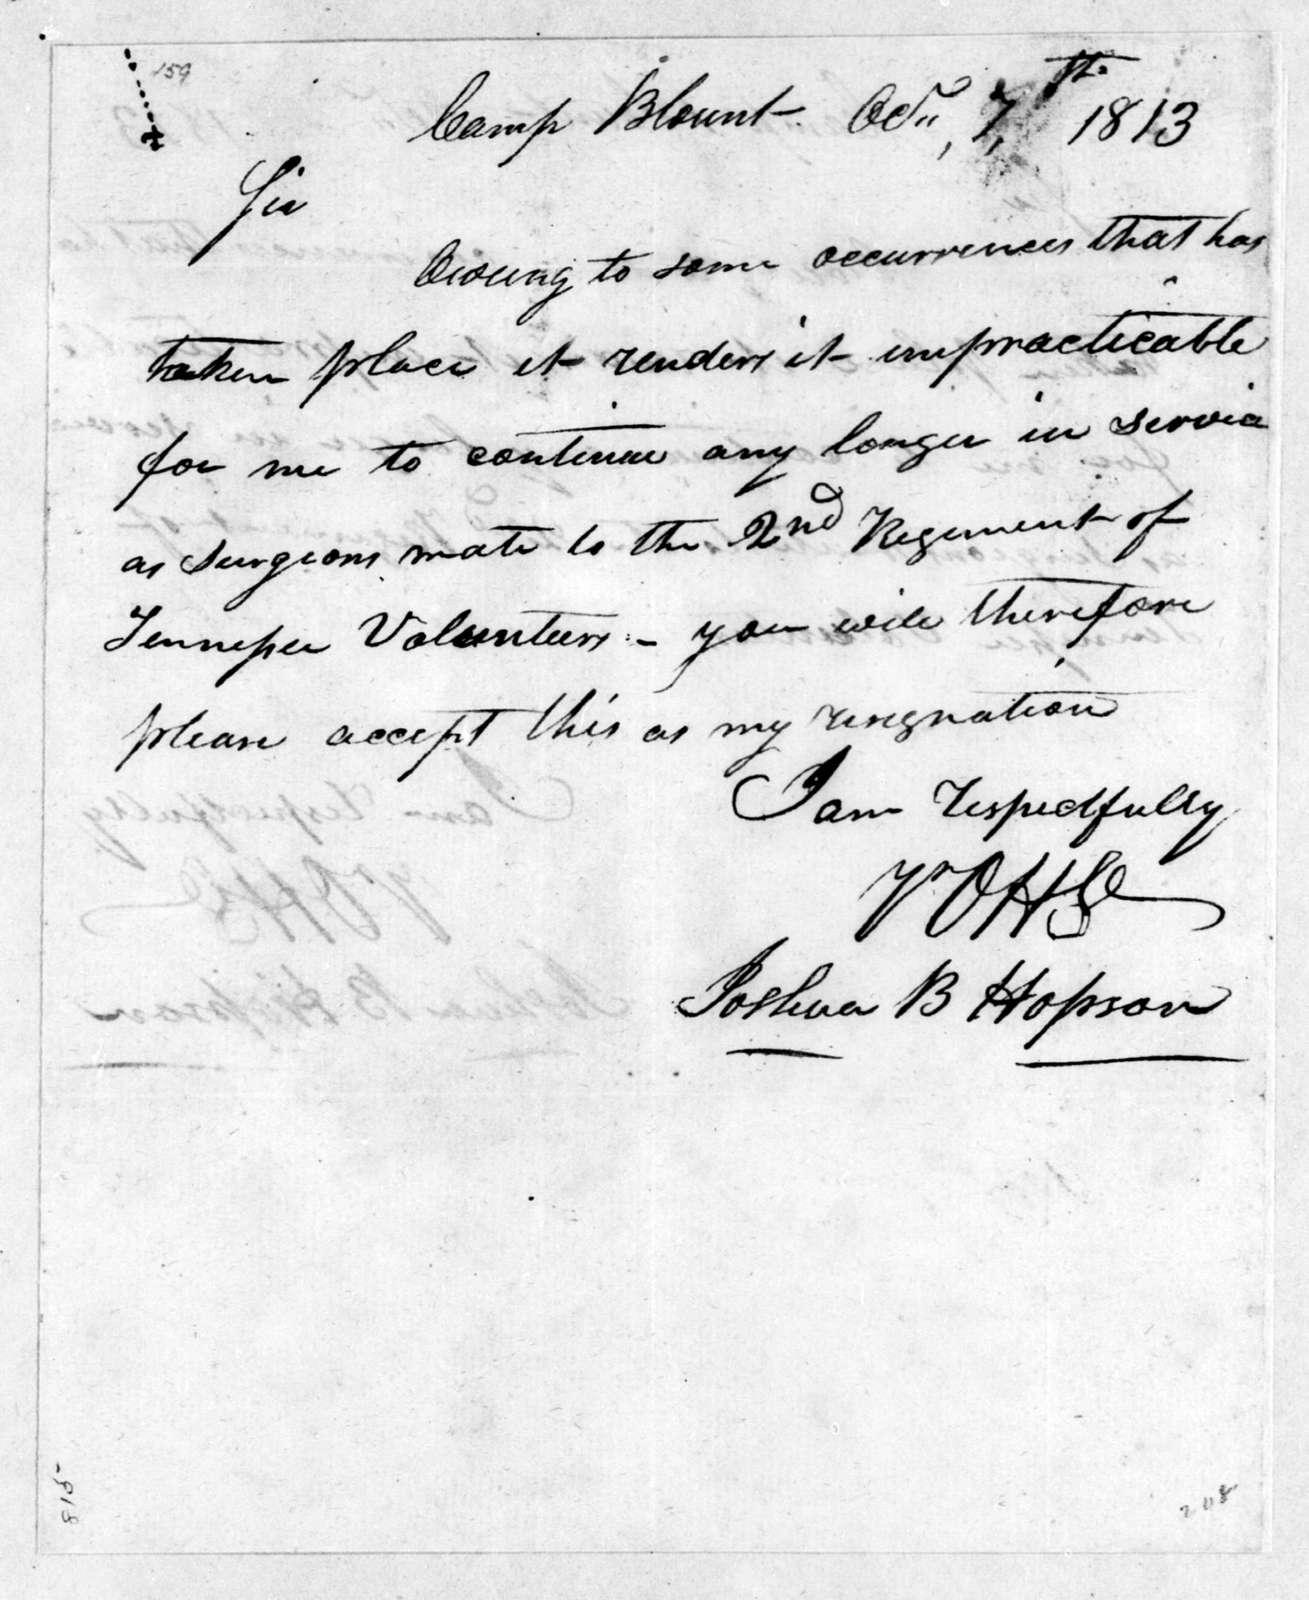 Joshua B. Hobson to Andrew Jackson, October 7, 1813